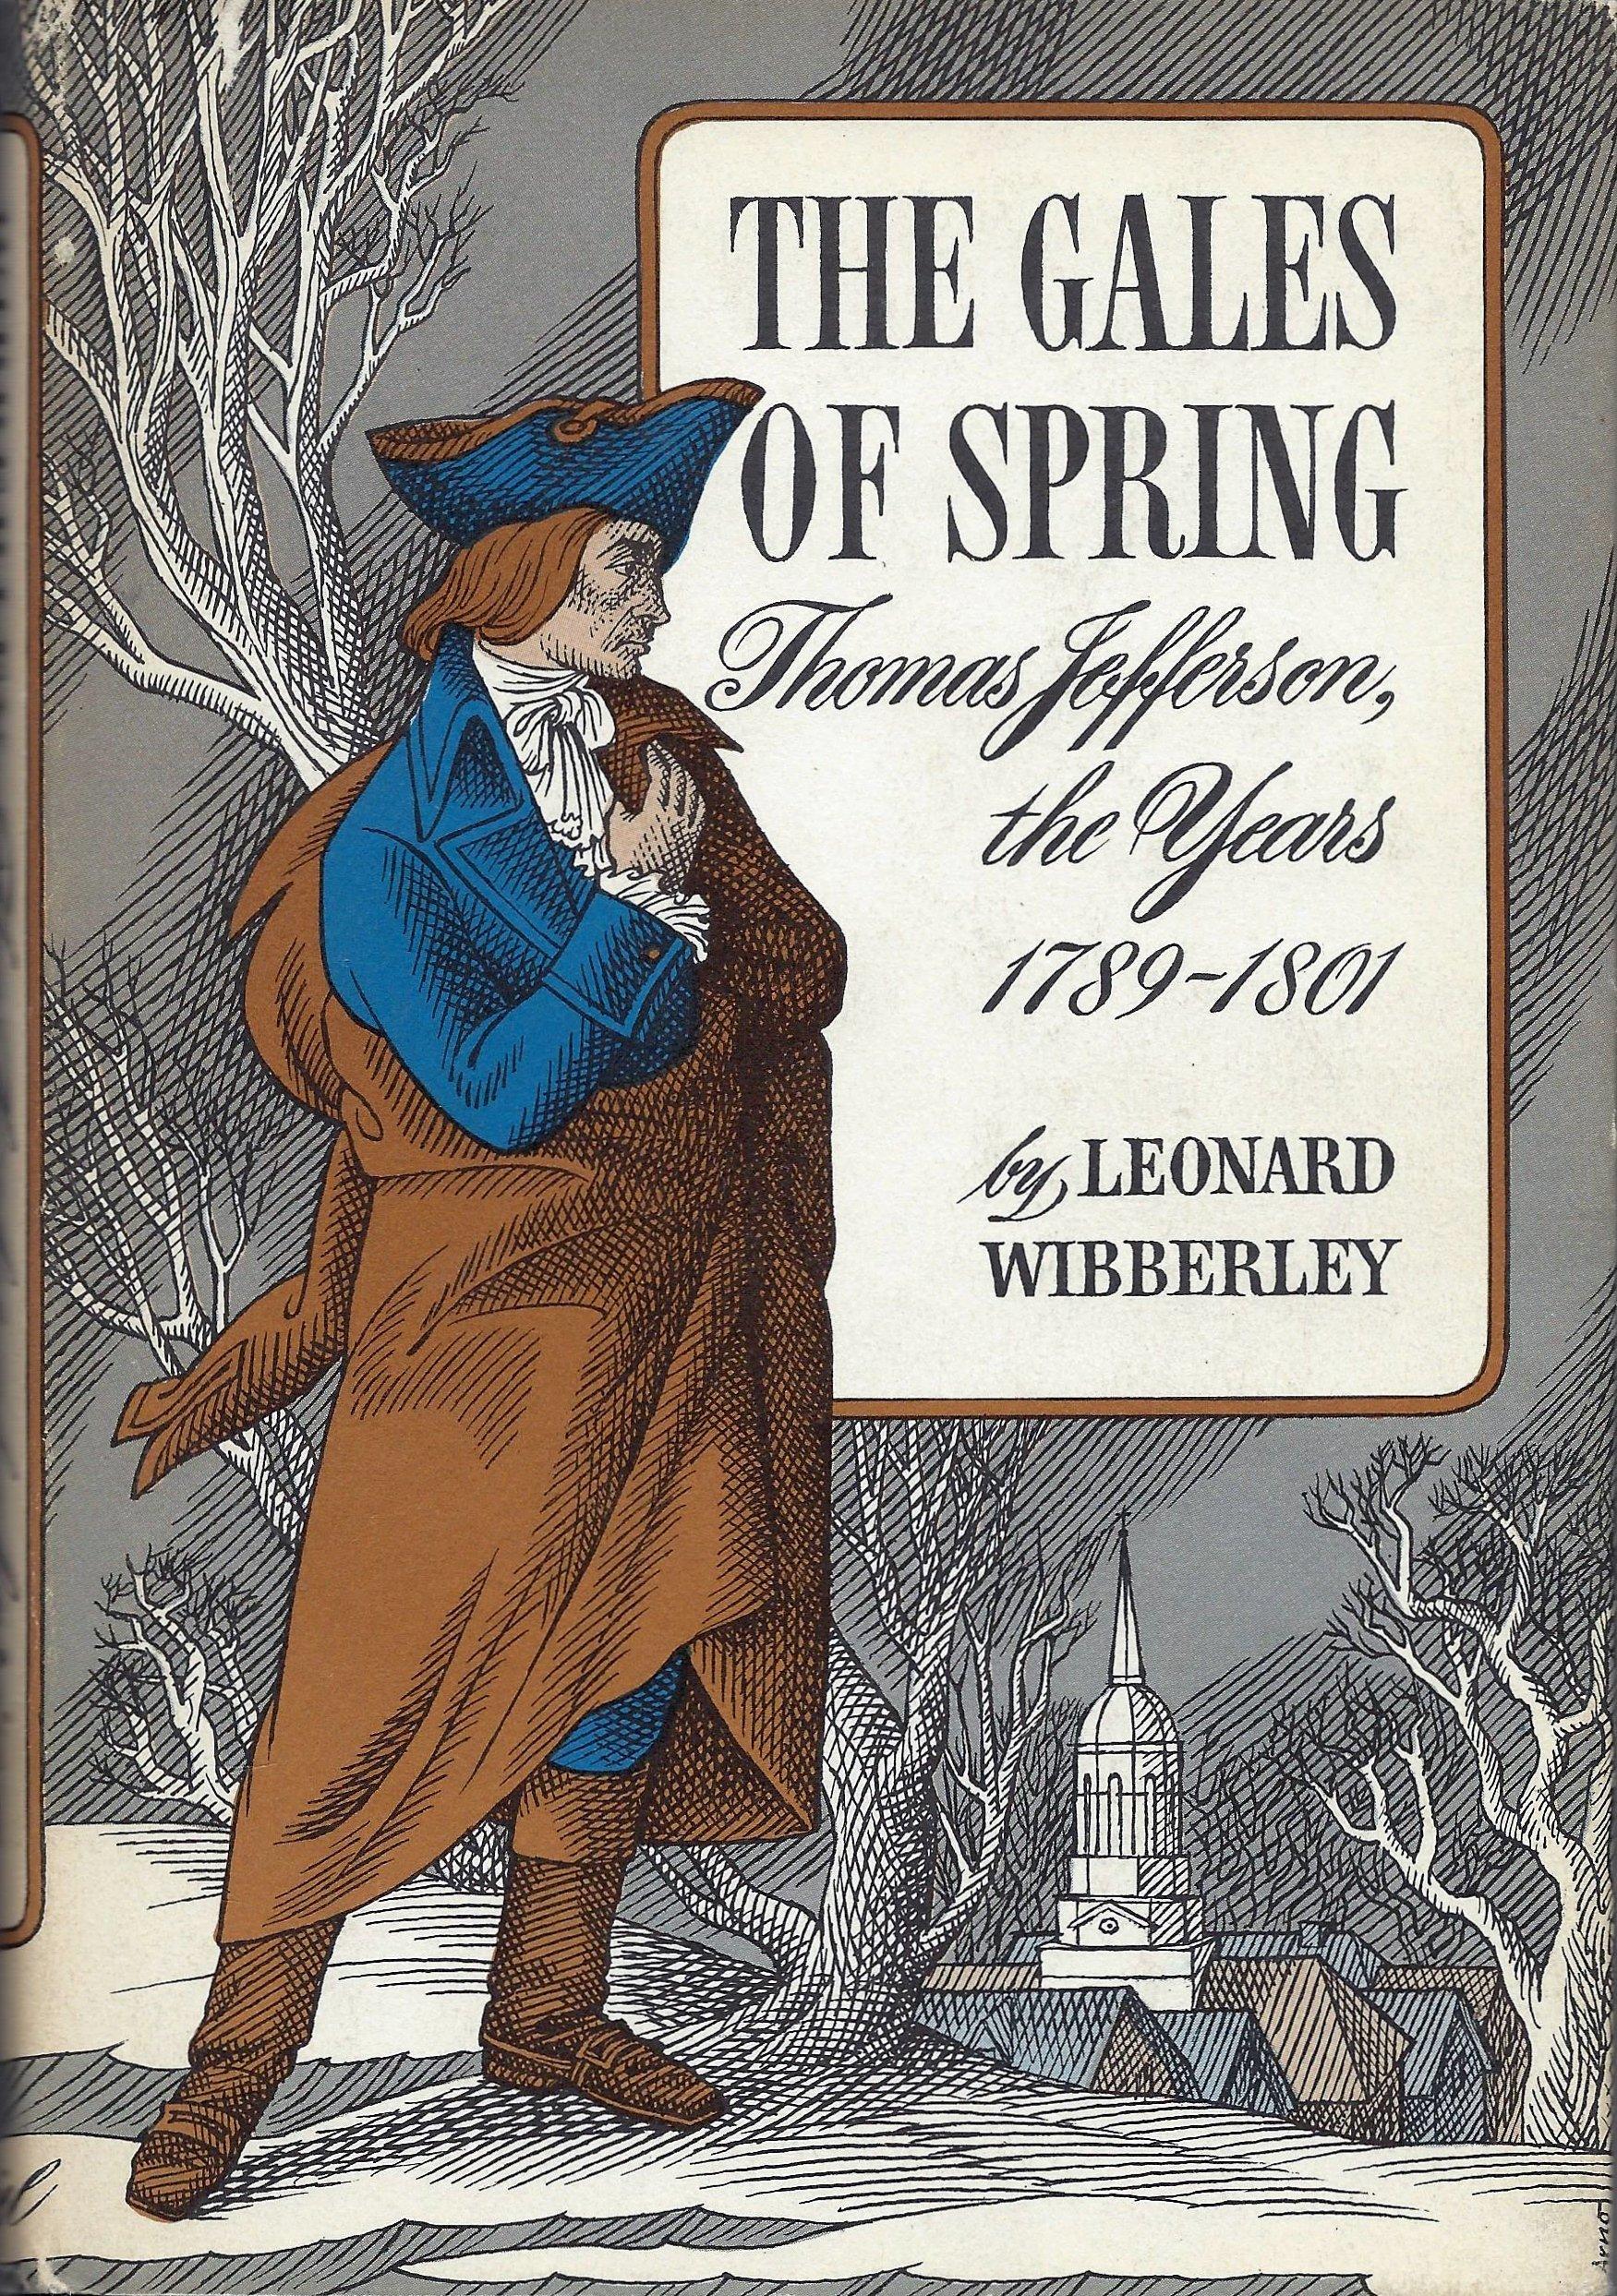 Spring thomas